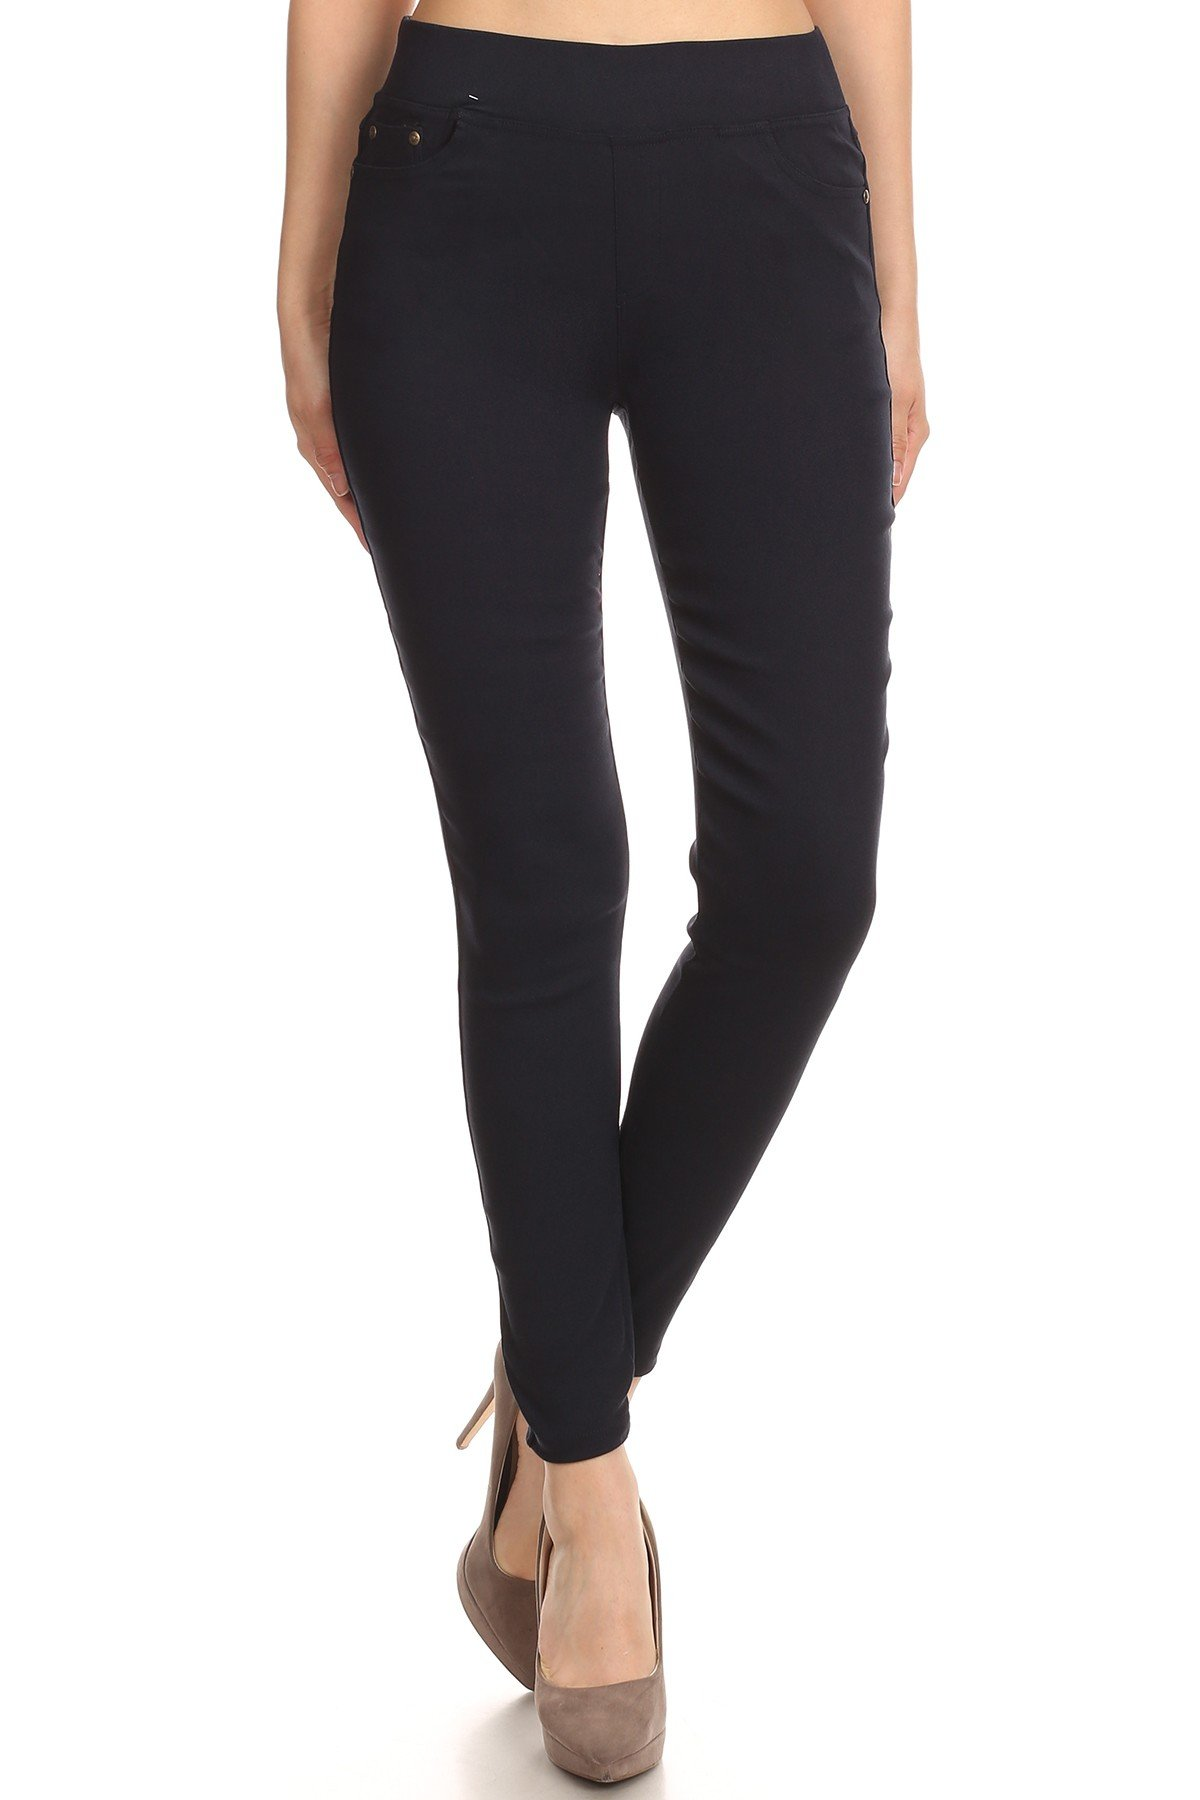 MissMissy Women's Casual Color Denim Slim Fit Skinny Elastic Waist Band Spandex Jeggings Ankle Jeans Pants (Large, Navy) by MissMissy